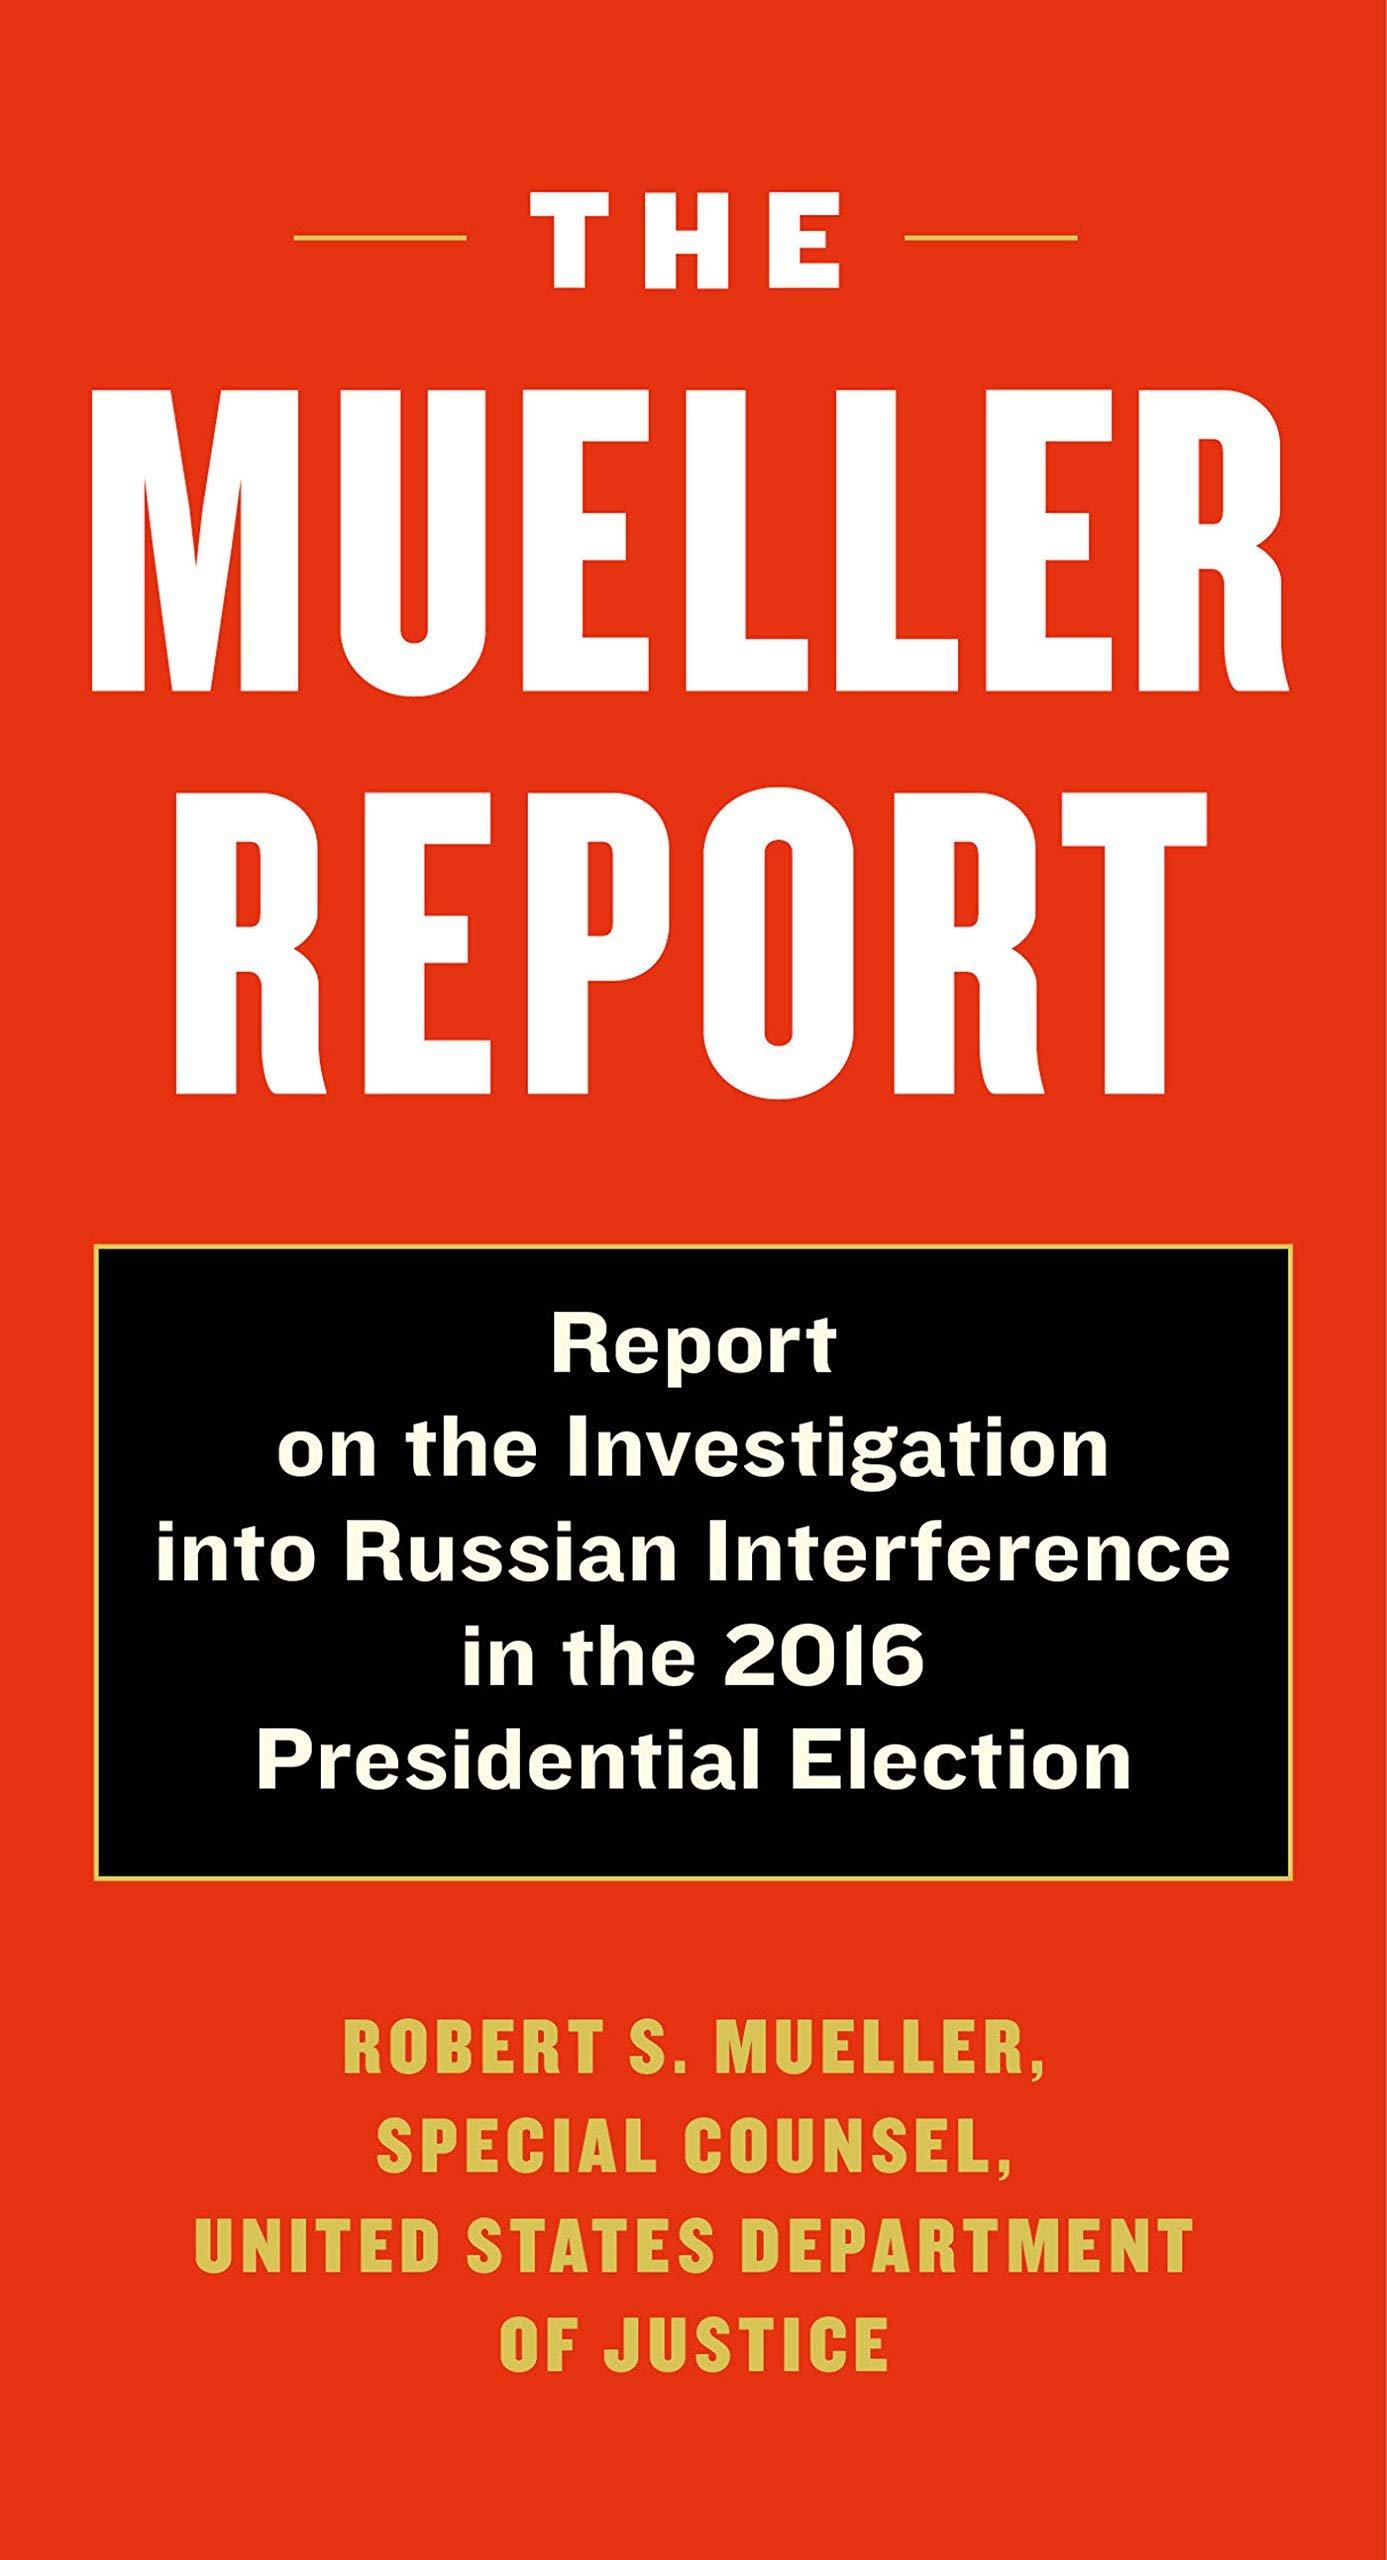 mueller report book cover